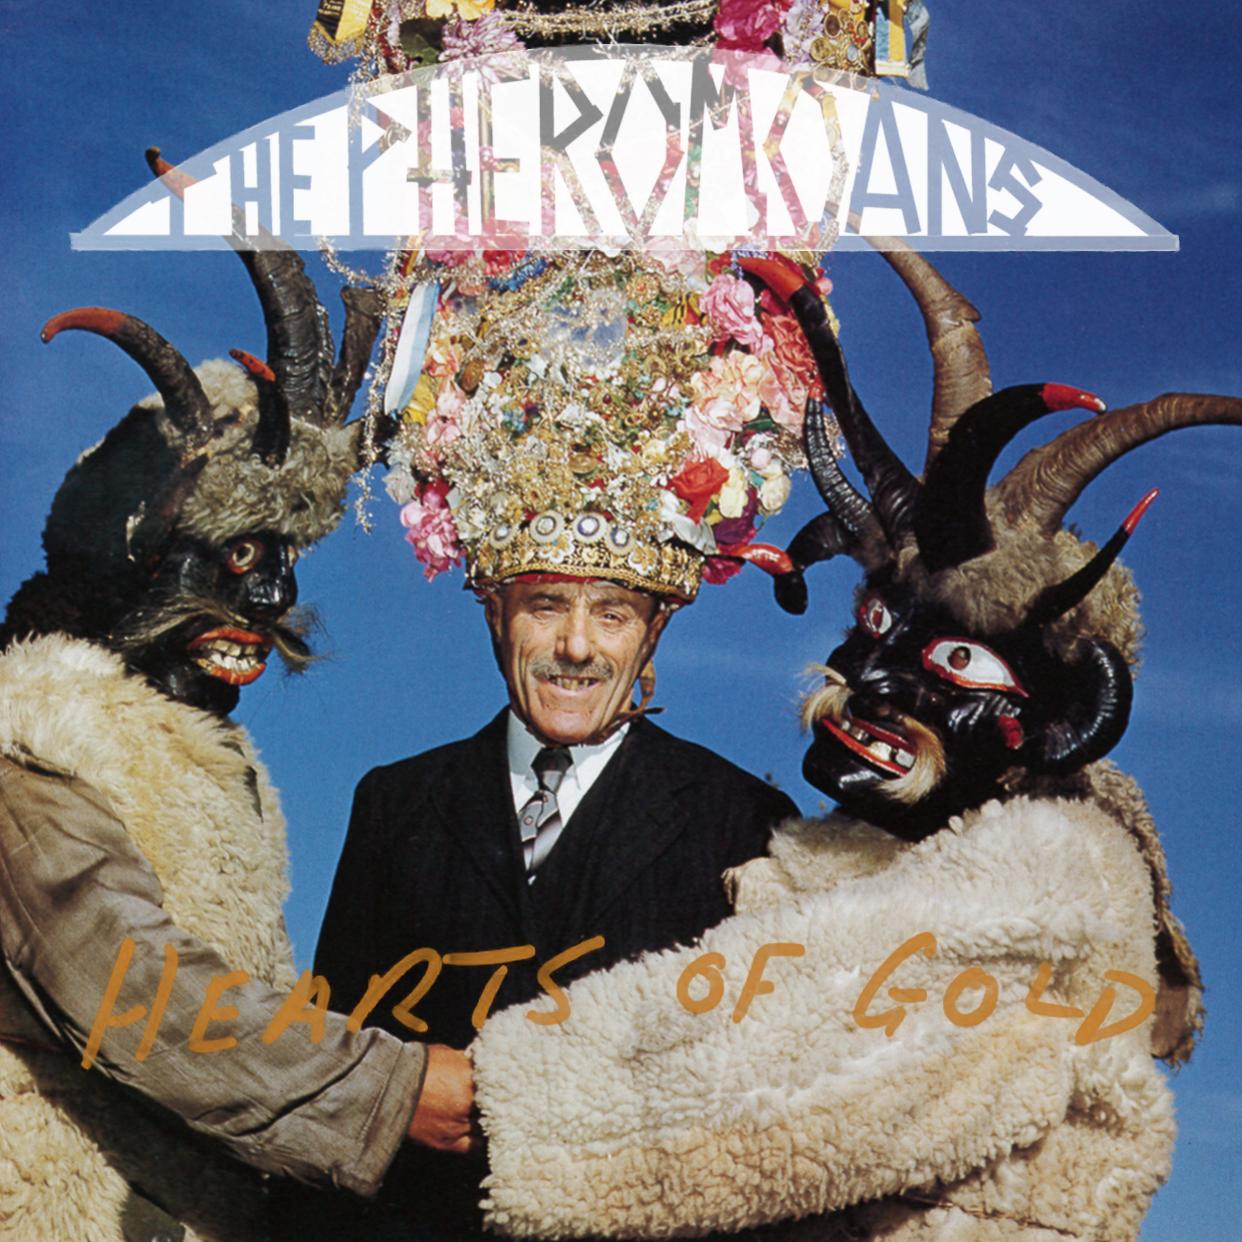 Pheromoans, The - The Pheromoans